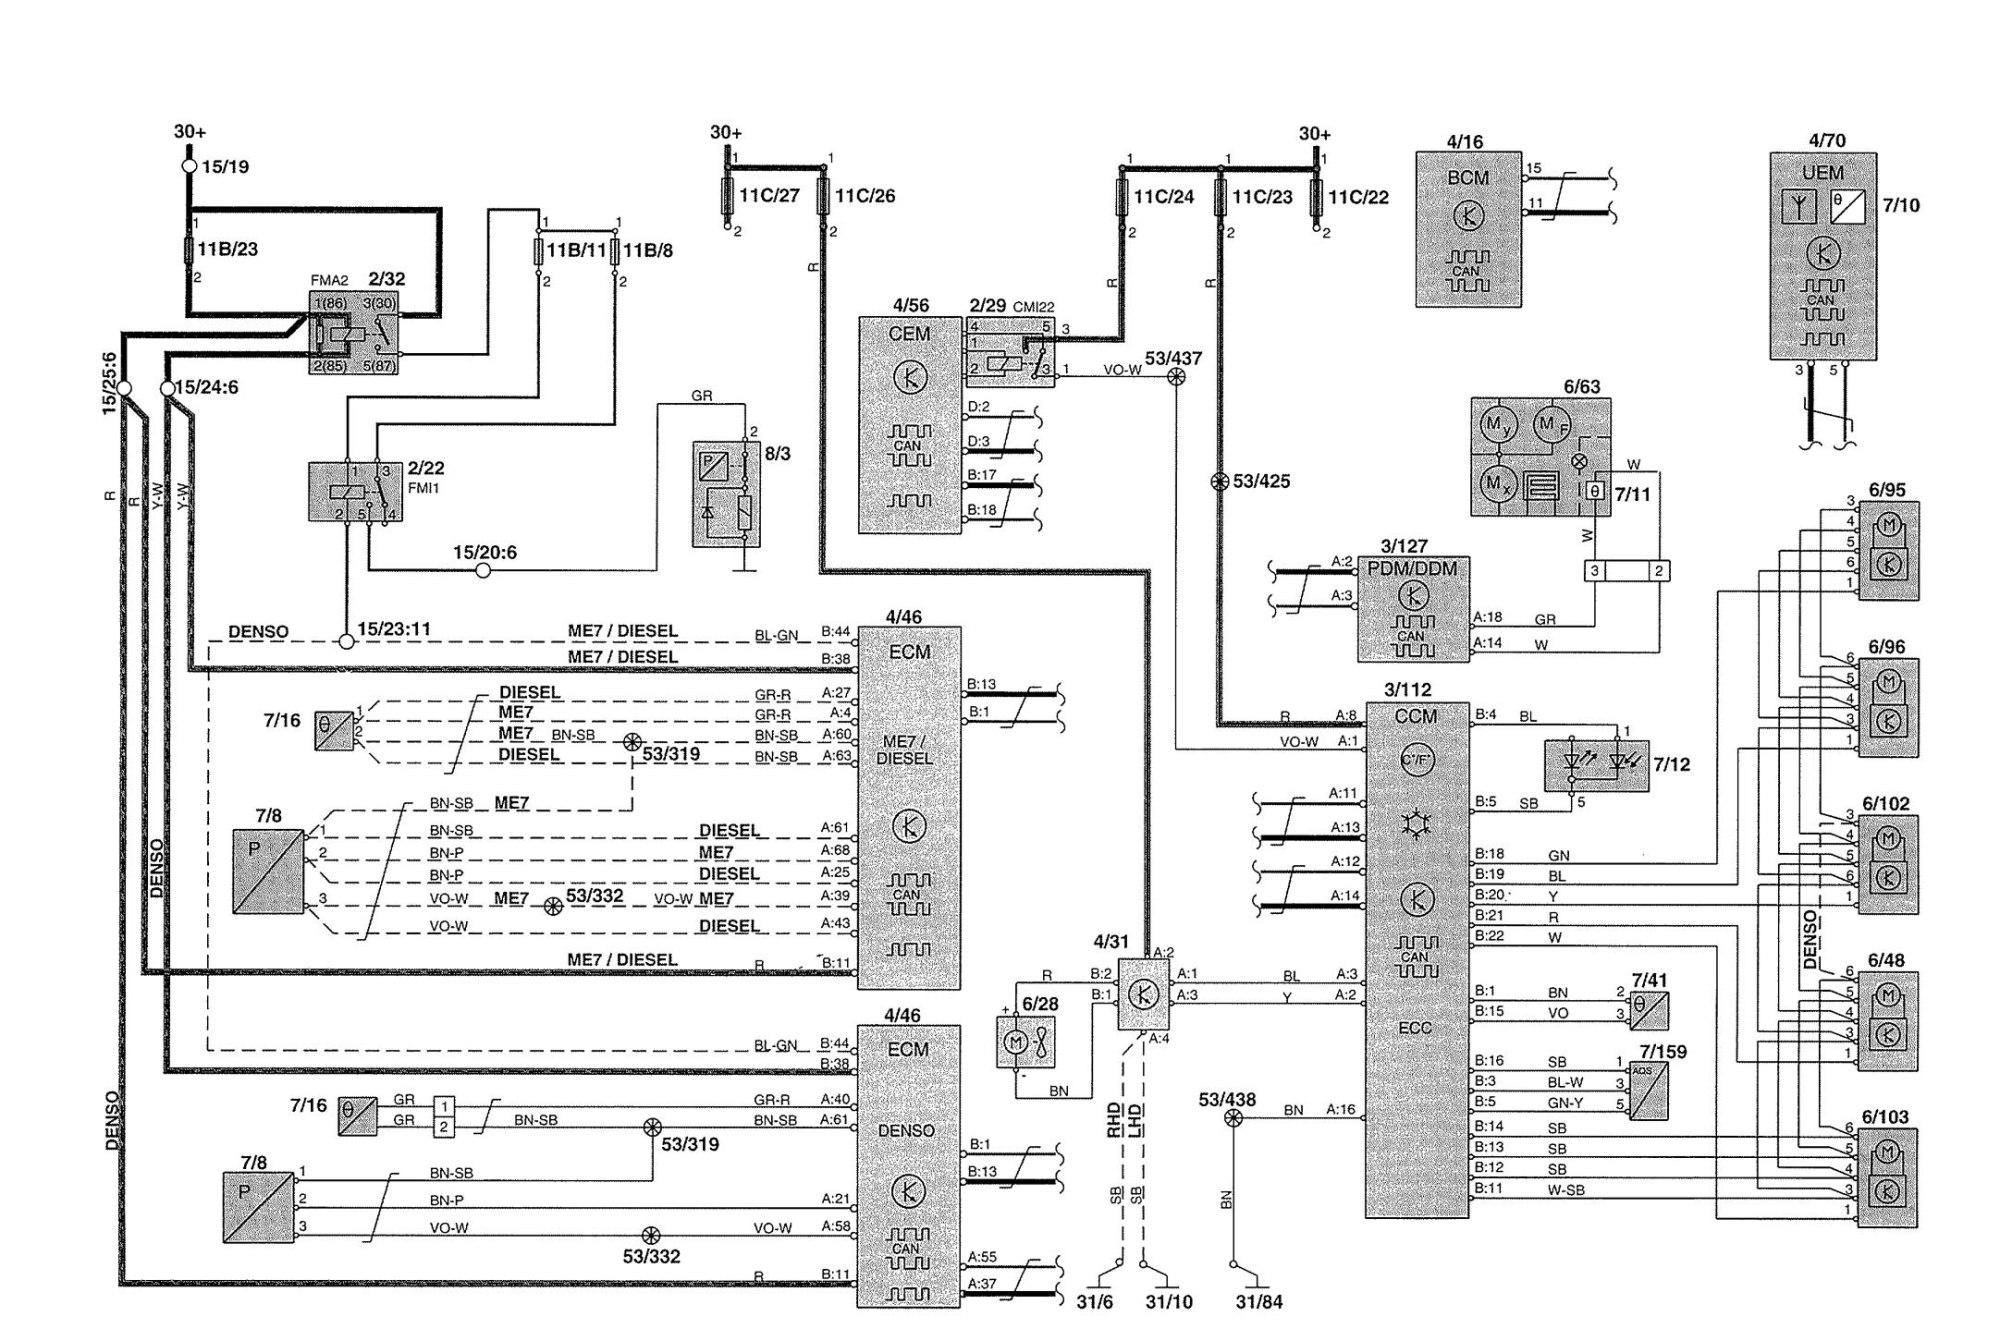 hight resolution of volvo v70 2002 wiring diagrams hvac controls volvo s70 wiring diagram volvo xc90 wiring diagram